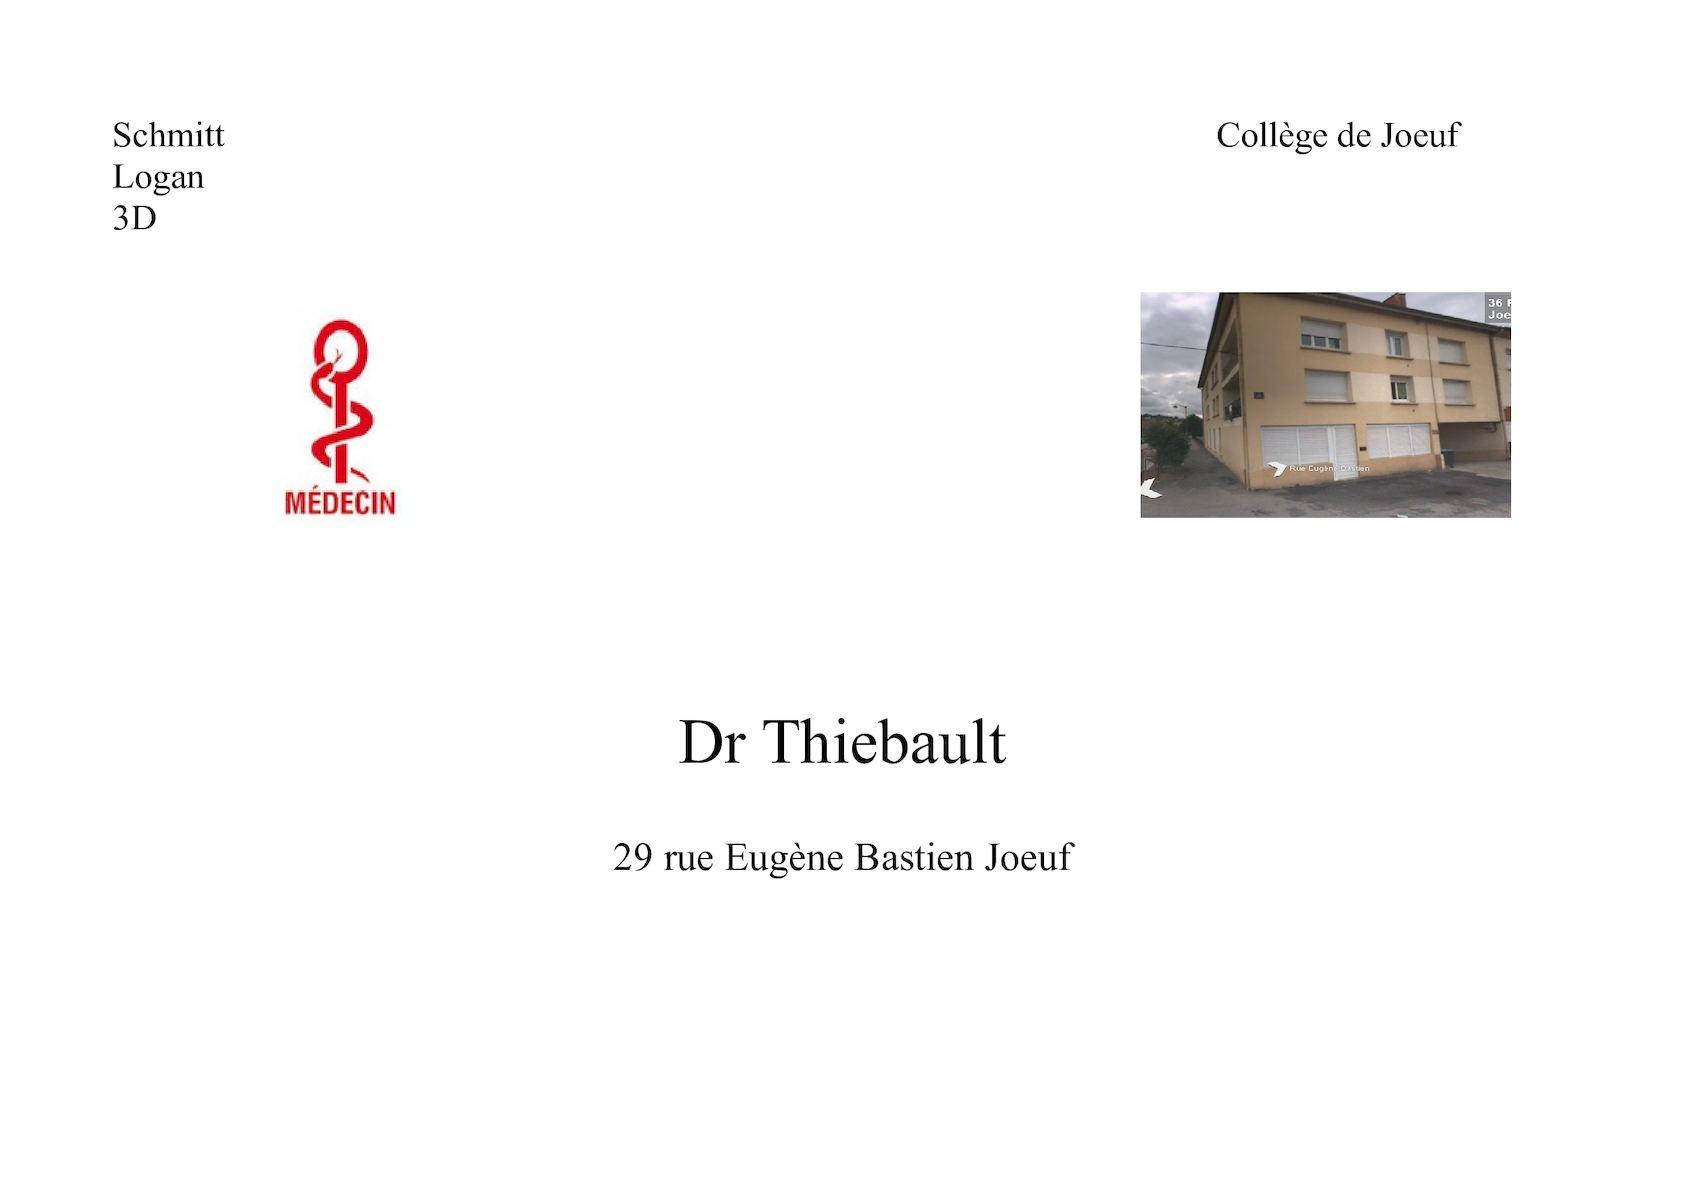 Calam o rapport de stage logan - Rapport de stage cabinet medical ...